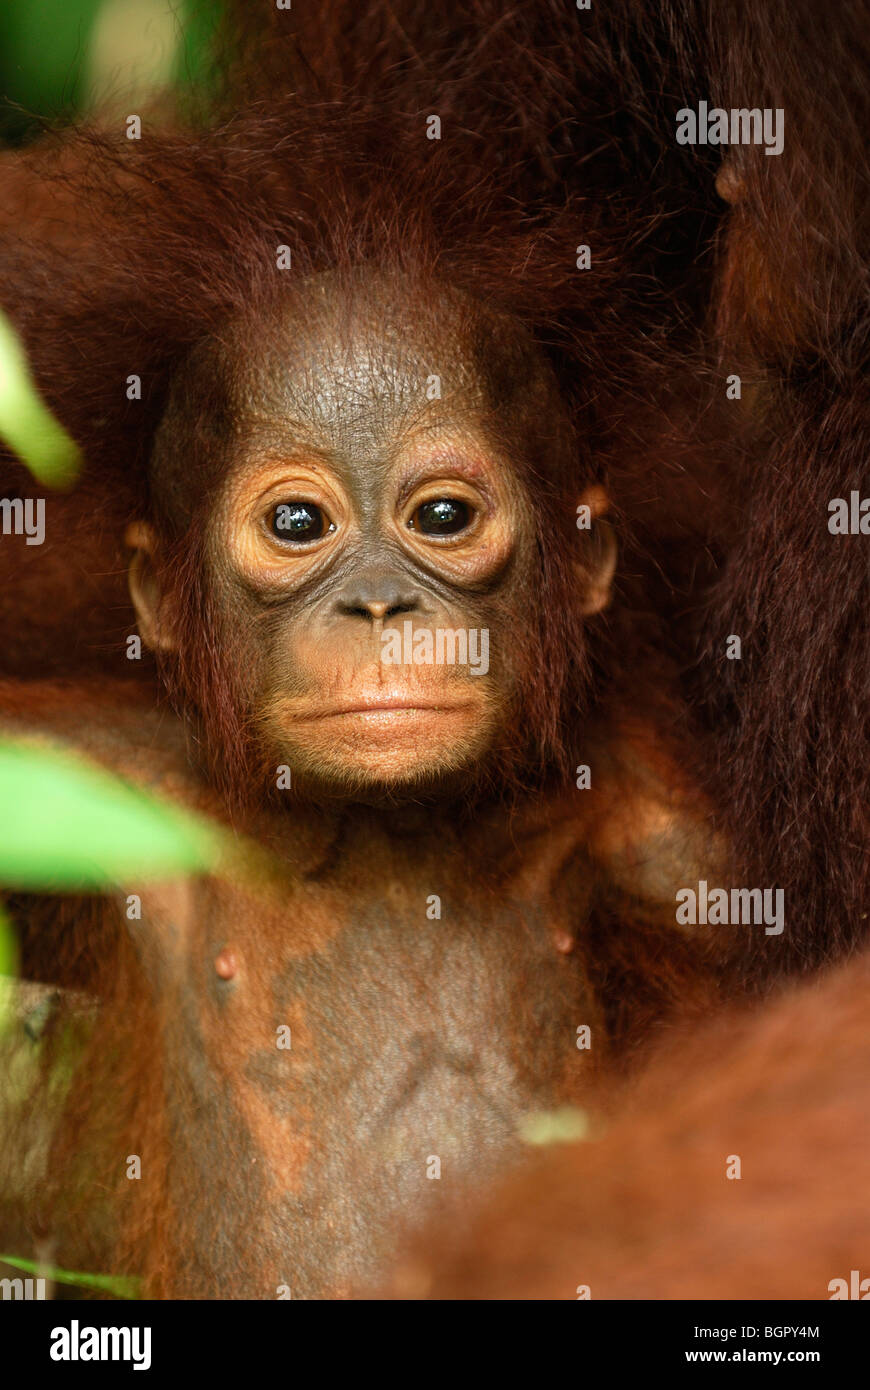 Borneo Orangutan baby (Pongo pygmaeus), giovani, Camp Leaky, Tanjung messa National Park, Kalimantan, Borneo, Indonesia Immagini Stock